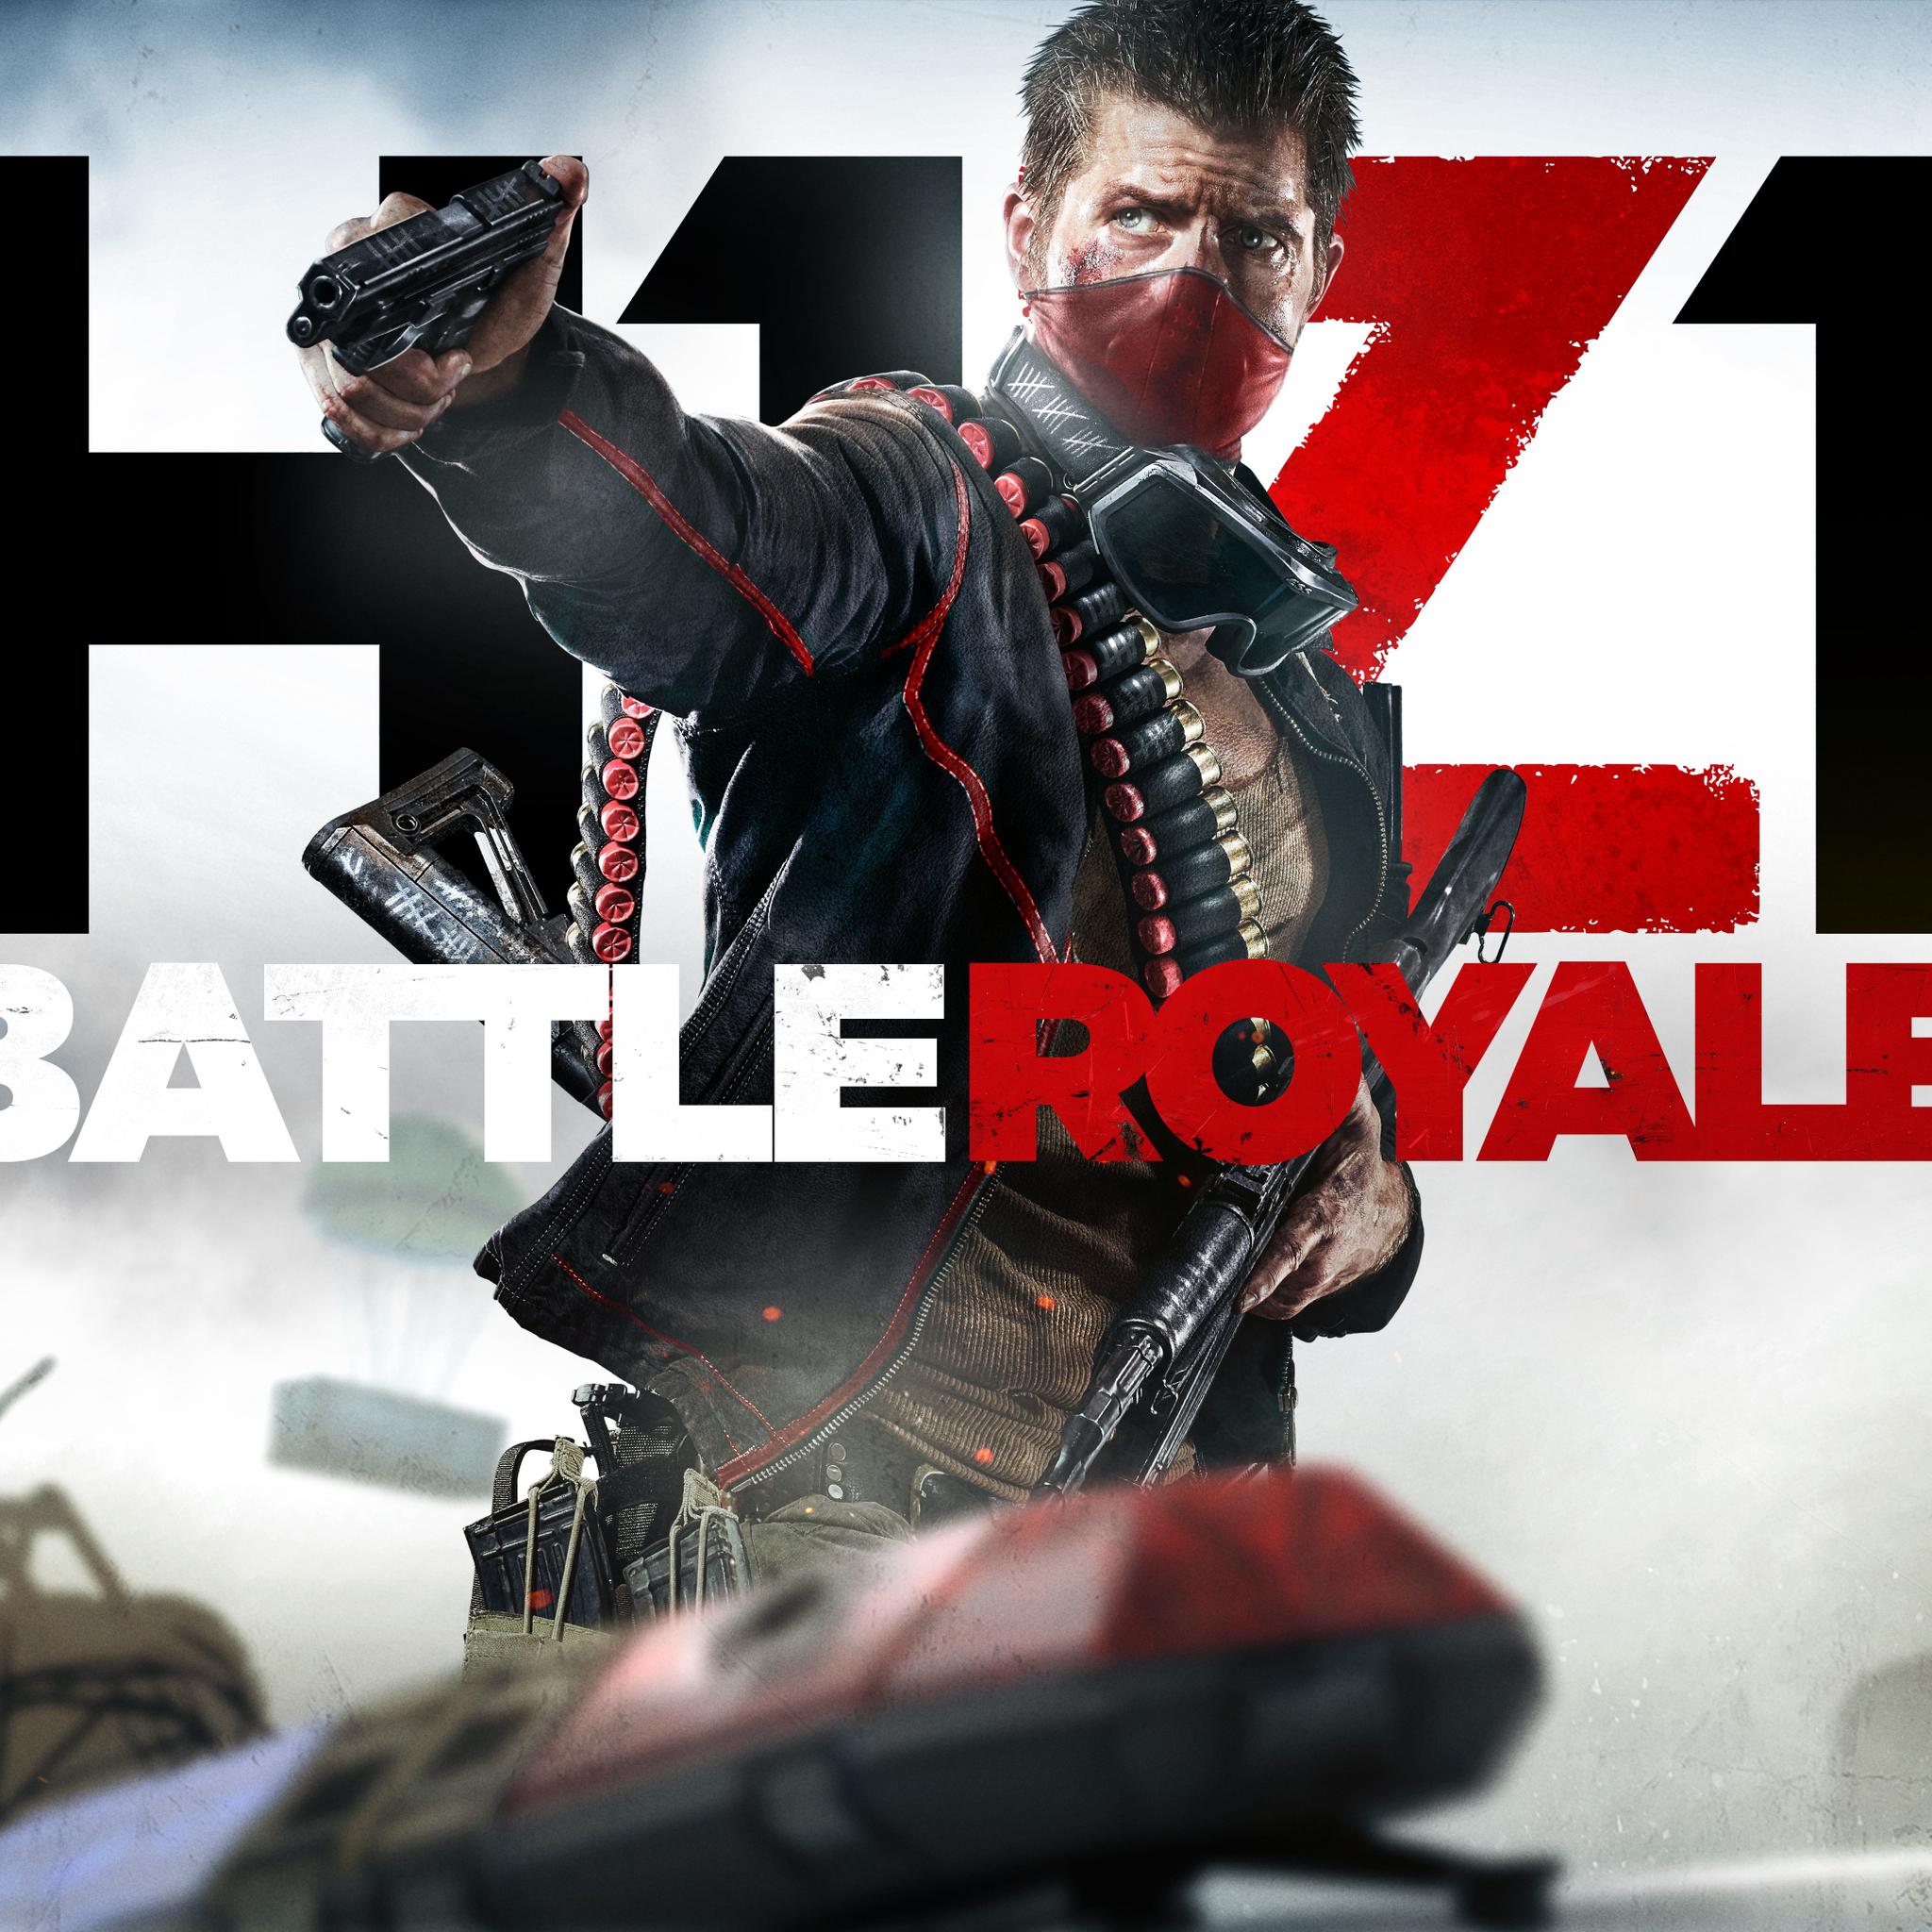 2048x2048 Battle Royale H1z1 4k Ipad Air HD 4k Wallpapers